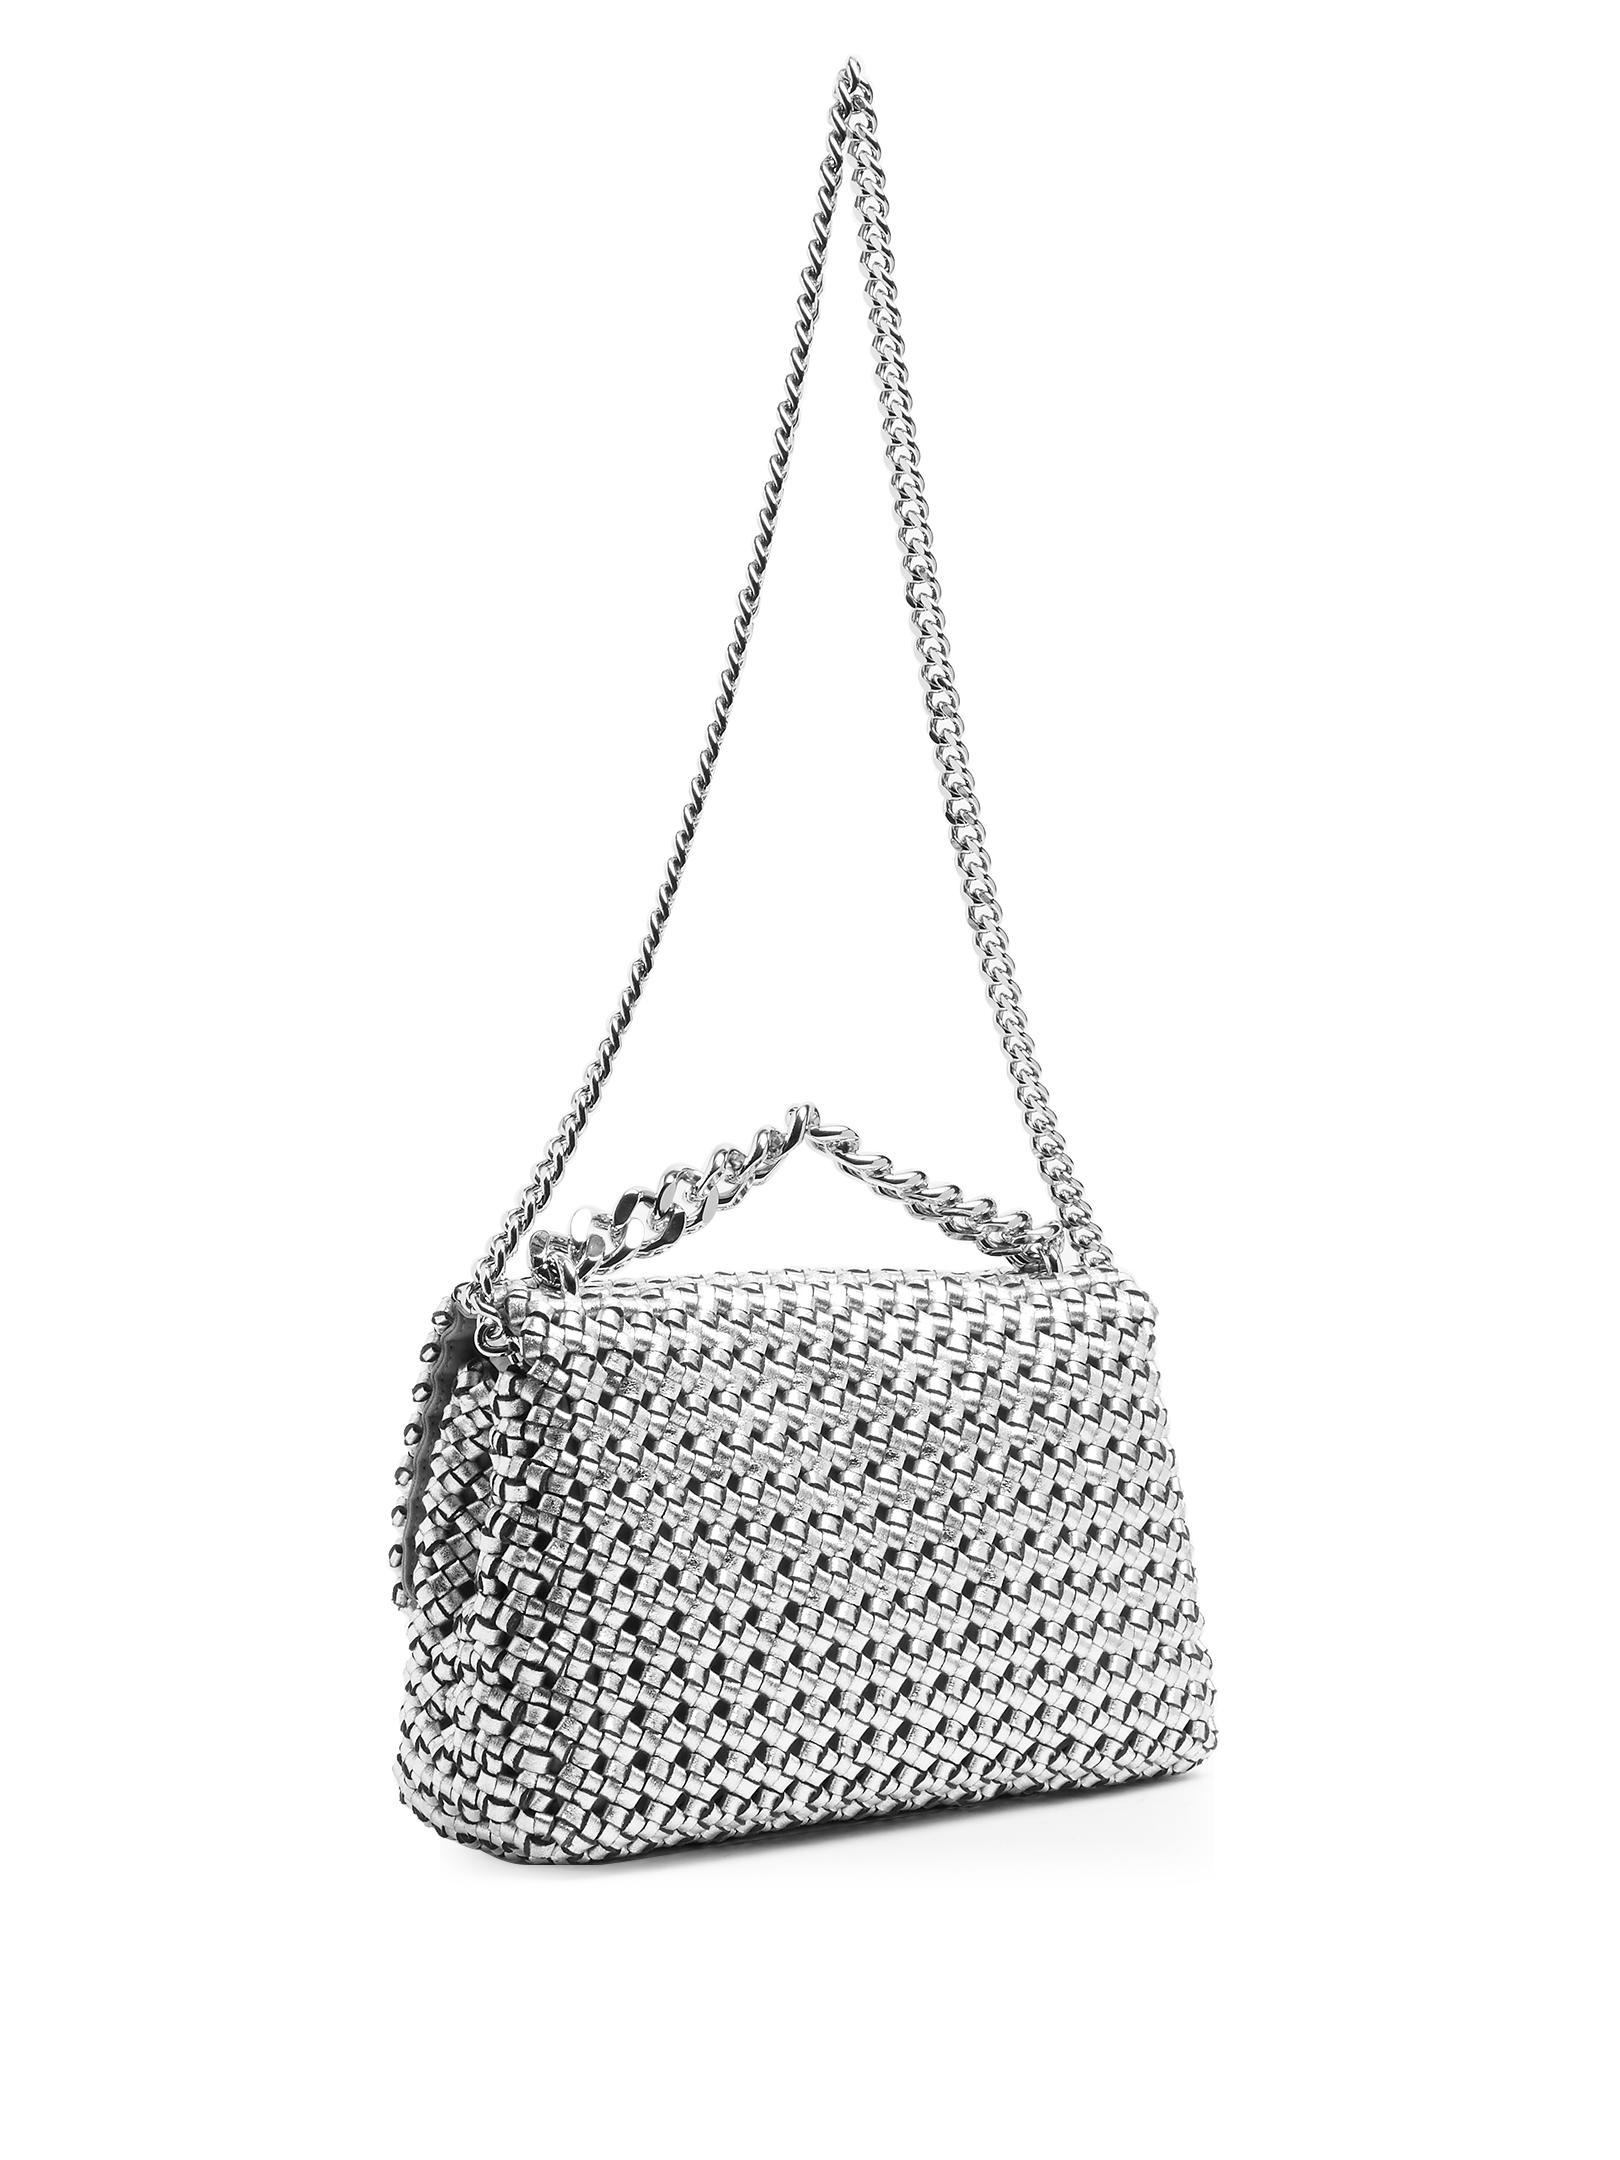 Stella McCartney Becks Woven Faux-leather Cross-body Bag in Metallic - Lyst 7b4150ed7c